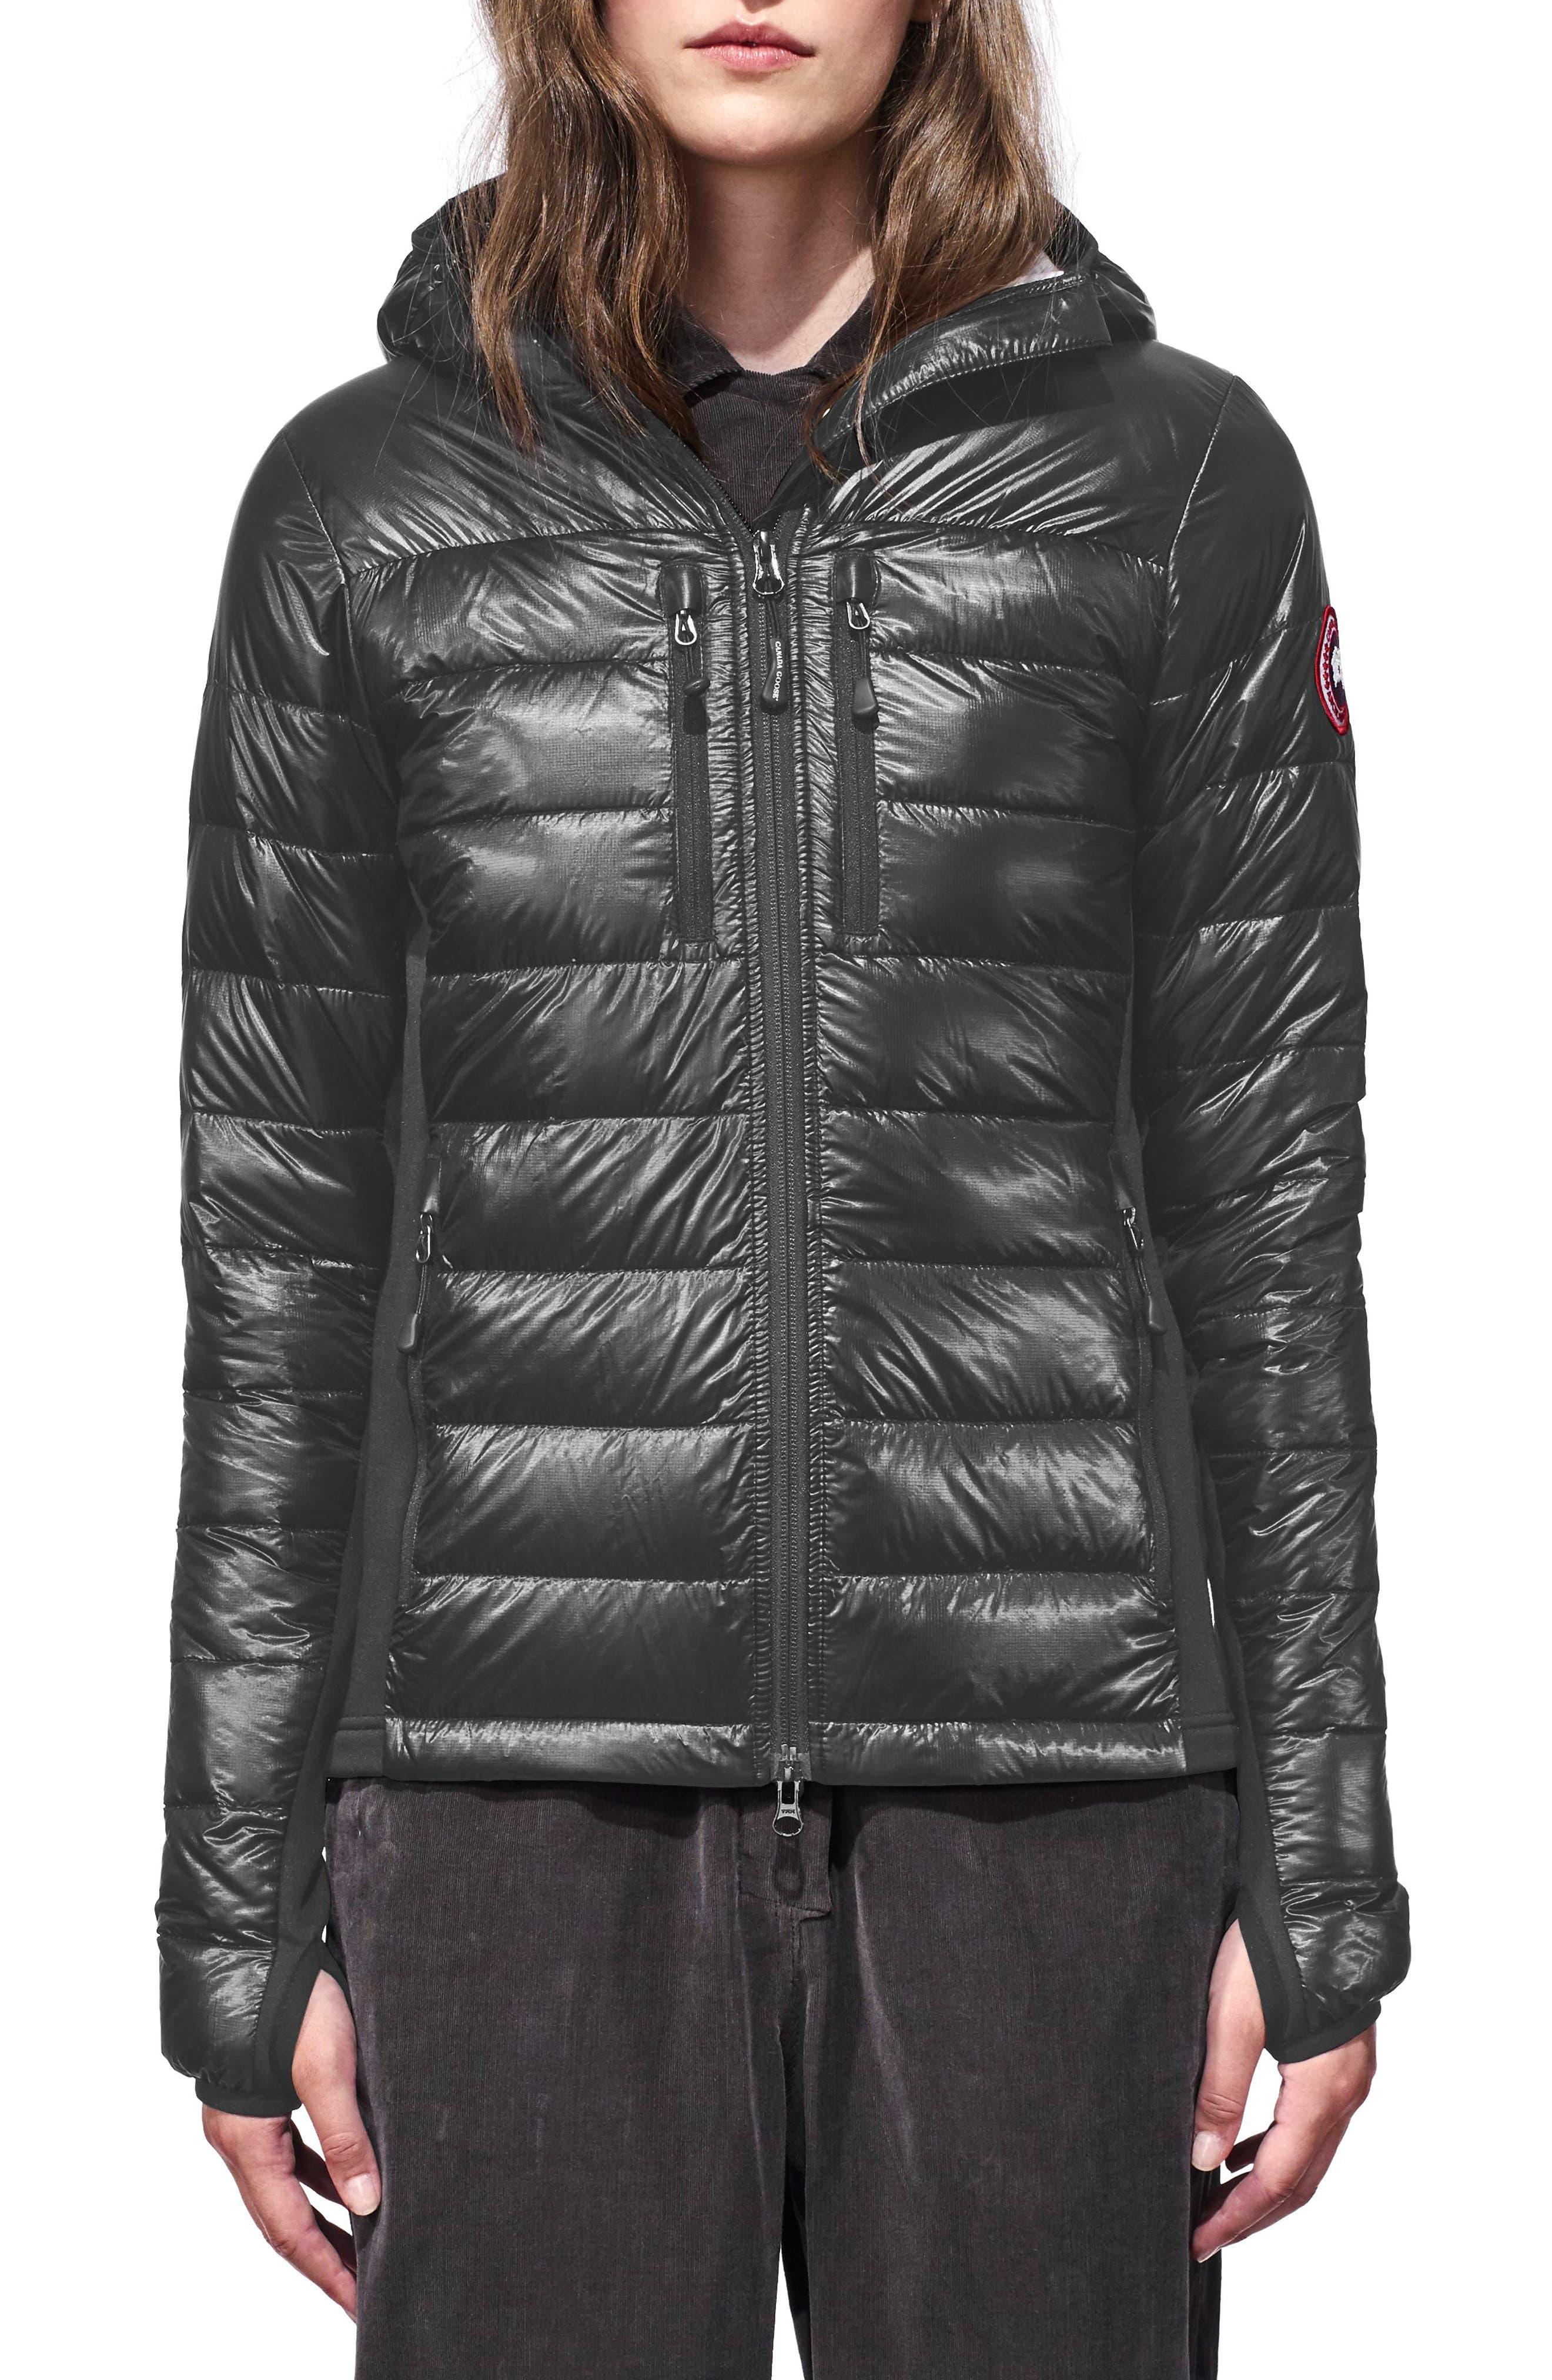 CANADA GOOSE, 'Hybridge Lite' Slim Fit Hooded Packable Down Jacket, Main thumbnail 1, color, S GRAPHITE/ L BLACK